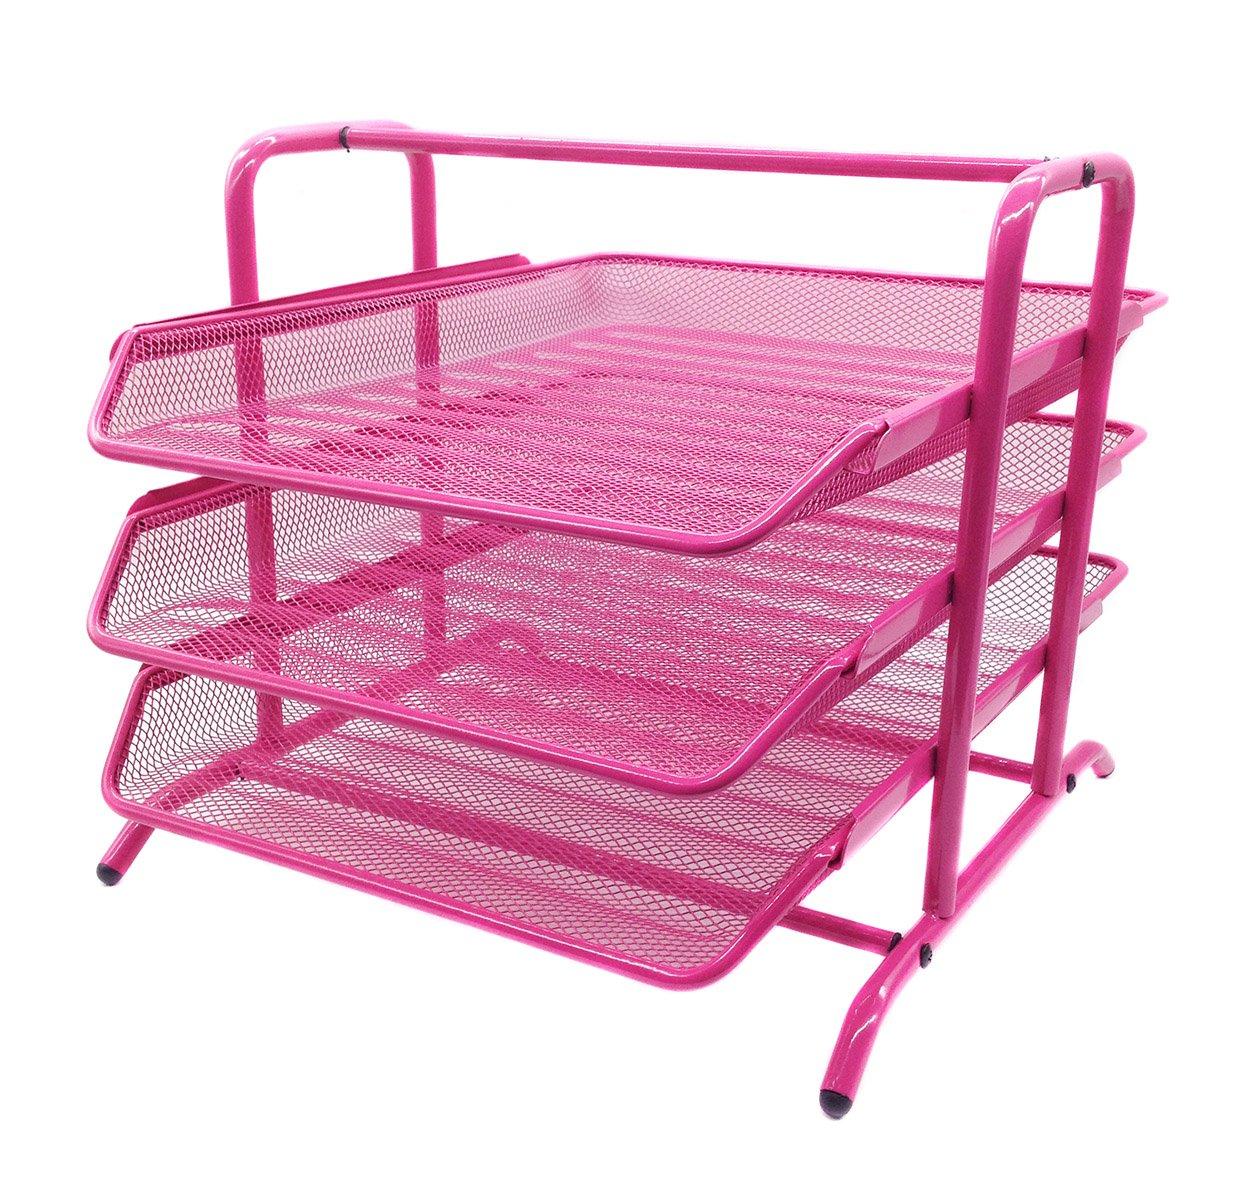 EasyPAG 3 Tier Mesh Desk Organizer Tray File Holder,Pink by EasyPAG